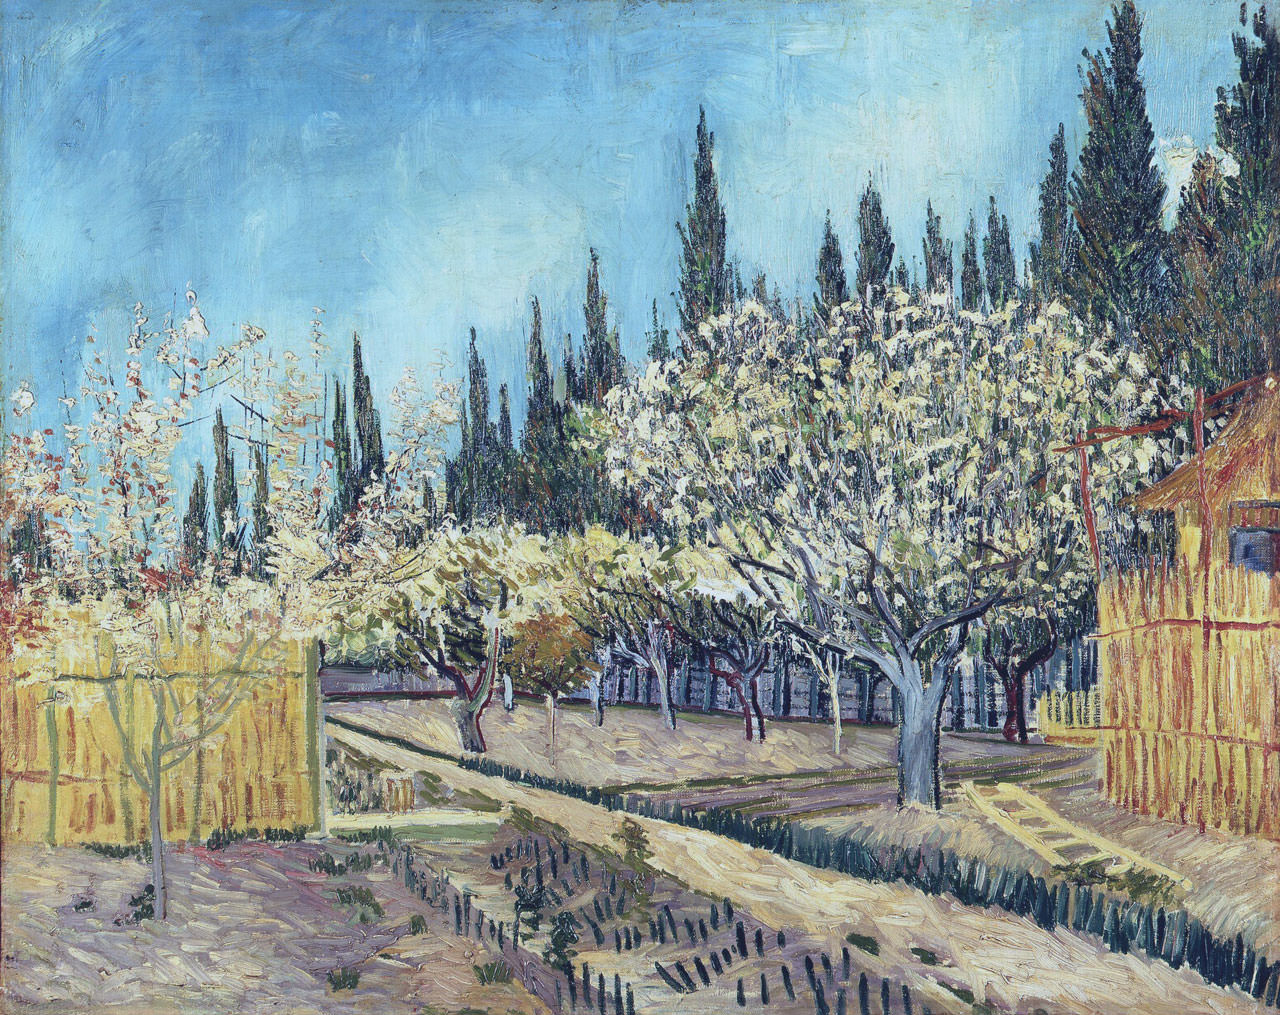 Сад, окружённый кипарисами [ картина - пейзаж ] :: Ван Гог, описание картины - Van Gogh (Ван Гог) фото